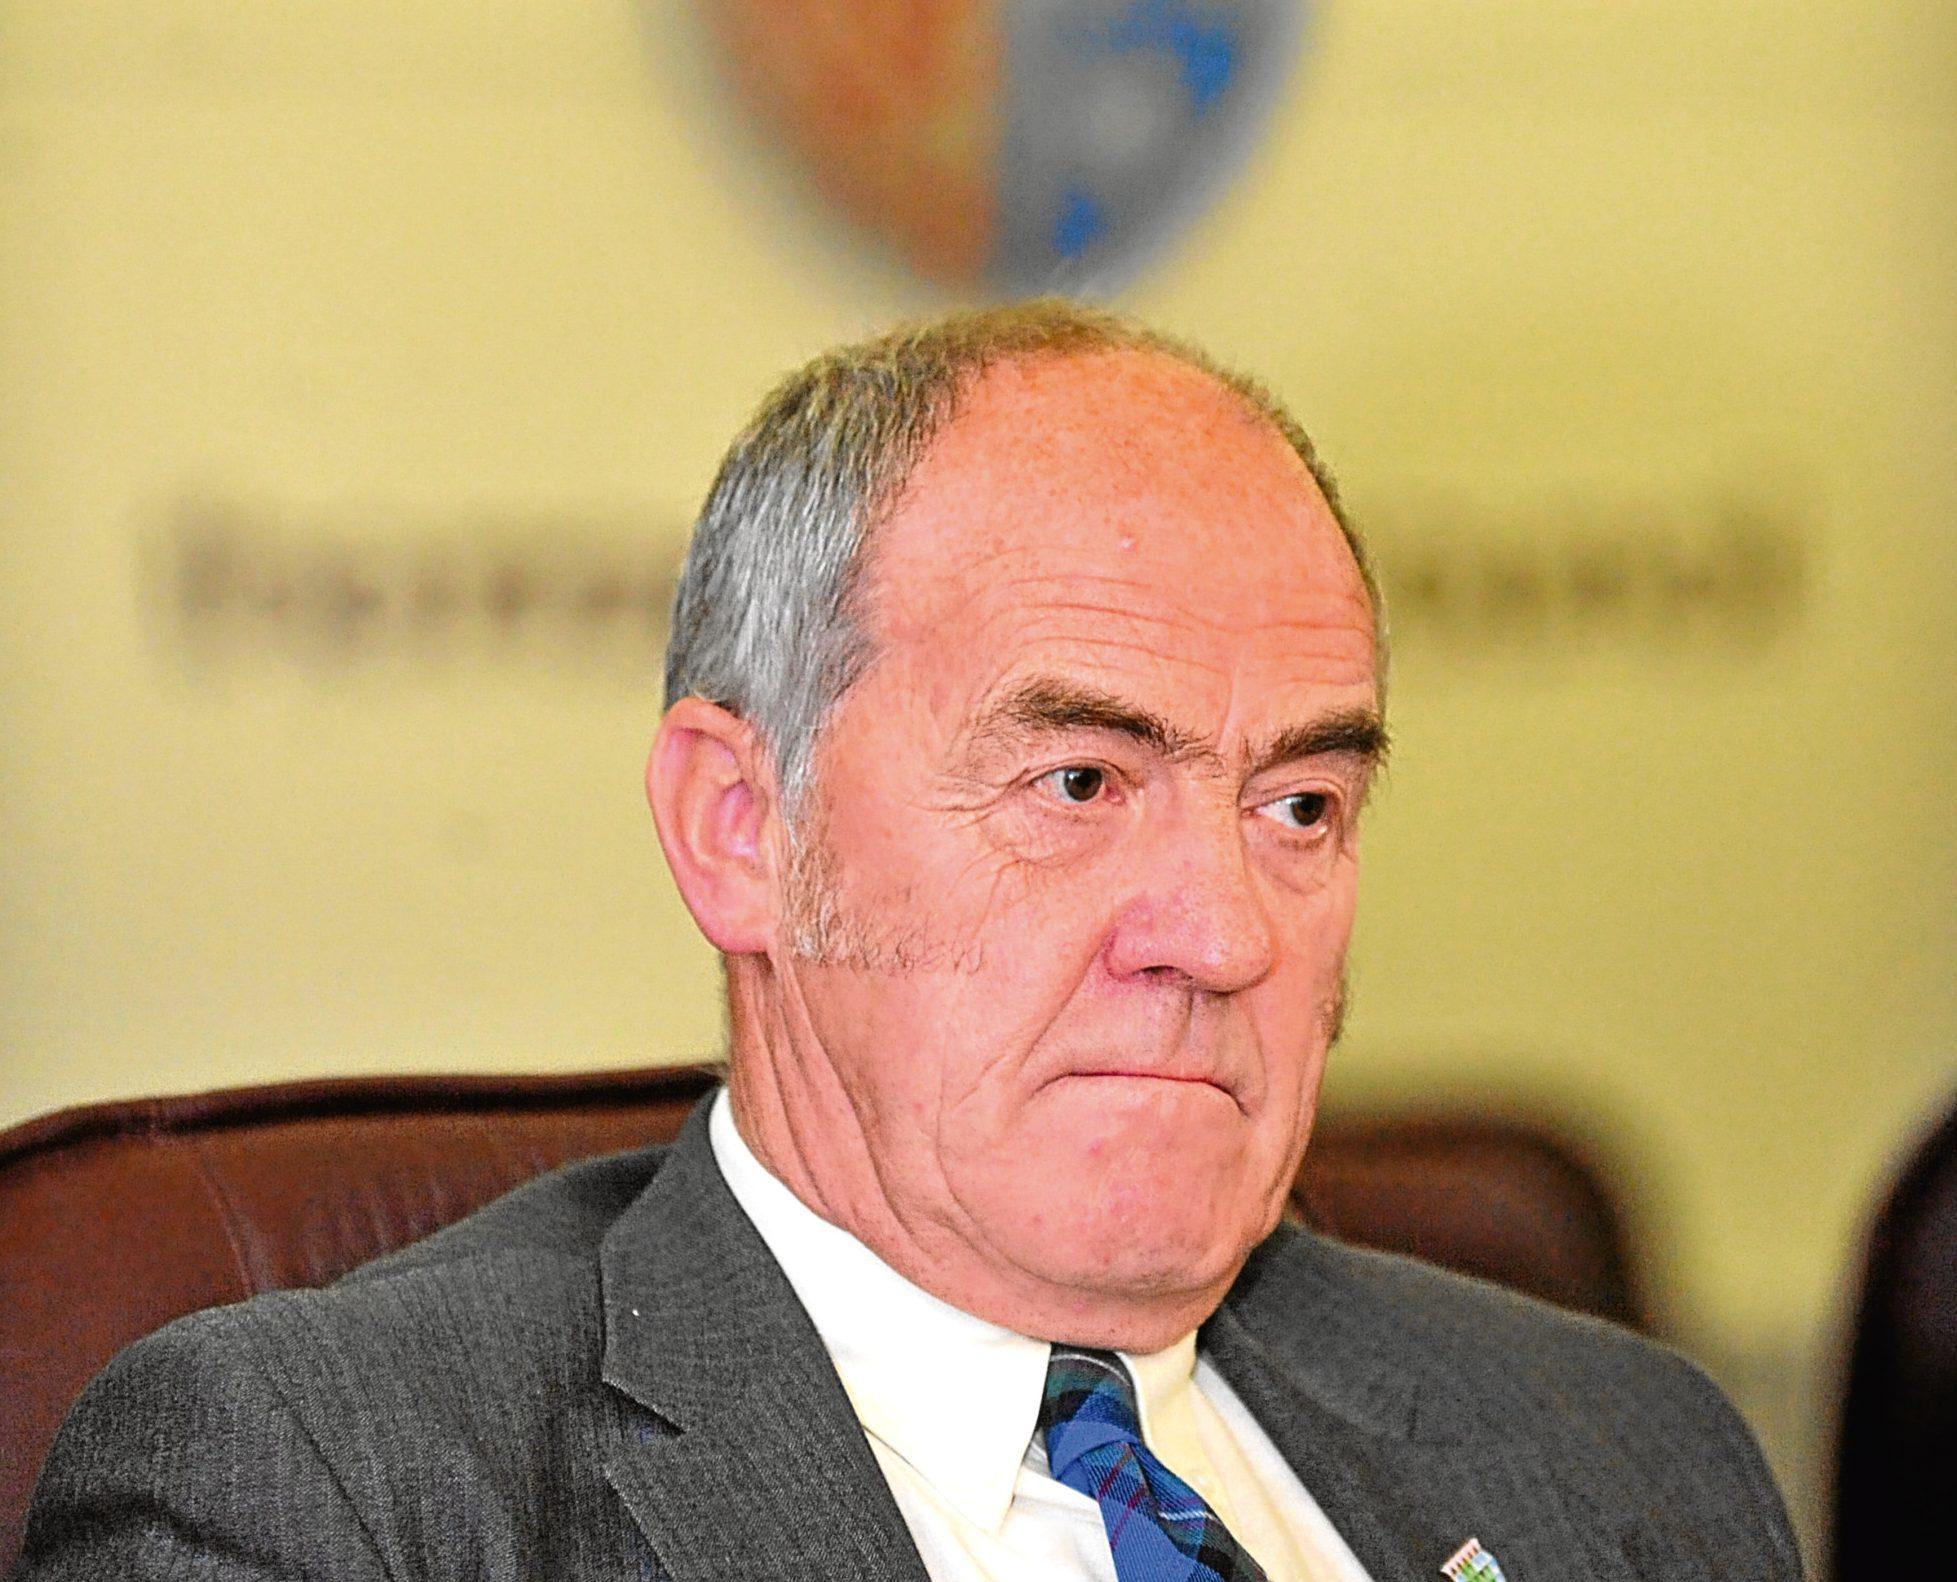 Moray Council leader George Alexander